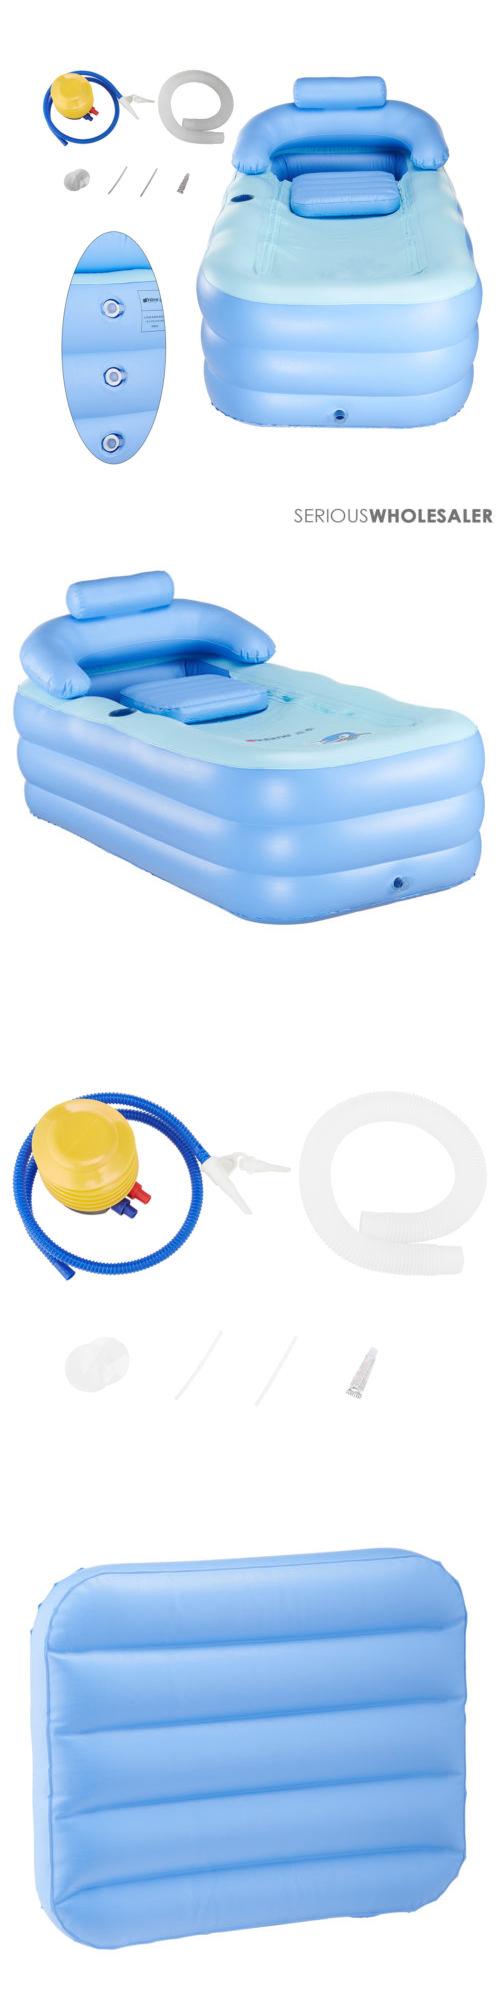 Bathtubs 42025: Inflatable Adult Pvc Folding Portable Blow Up ...